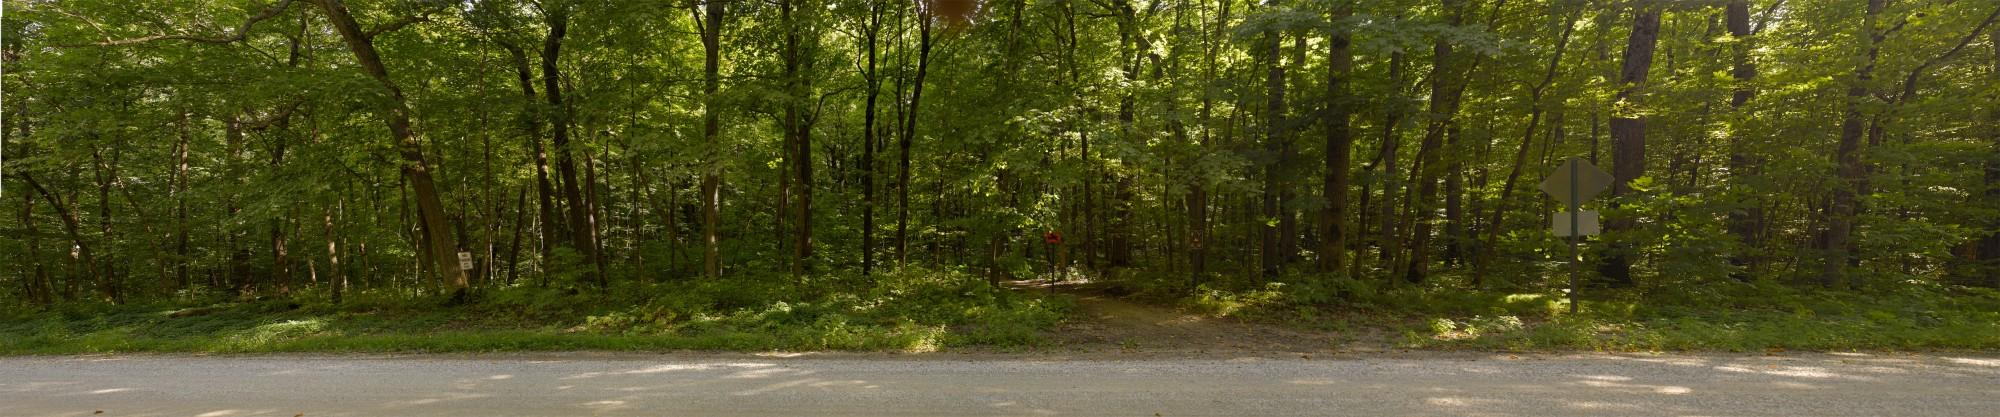 Translite summer trees, Richard Lund, summer, Minnesota